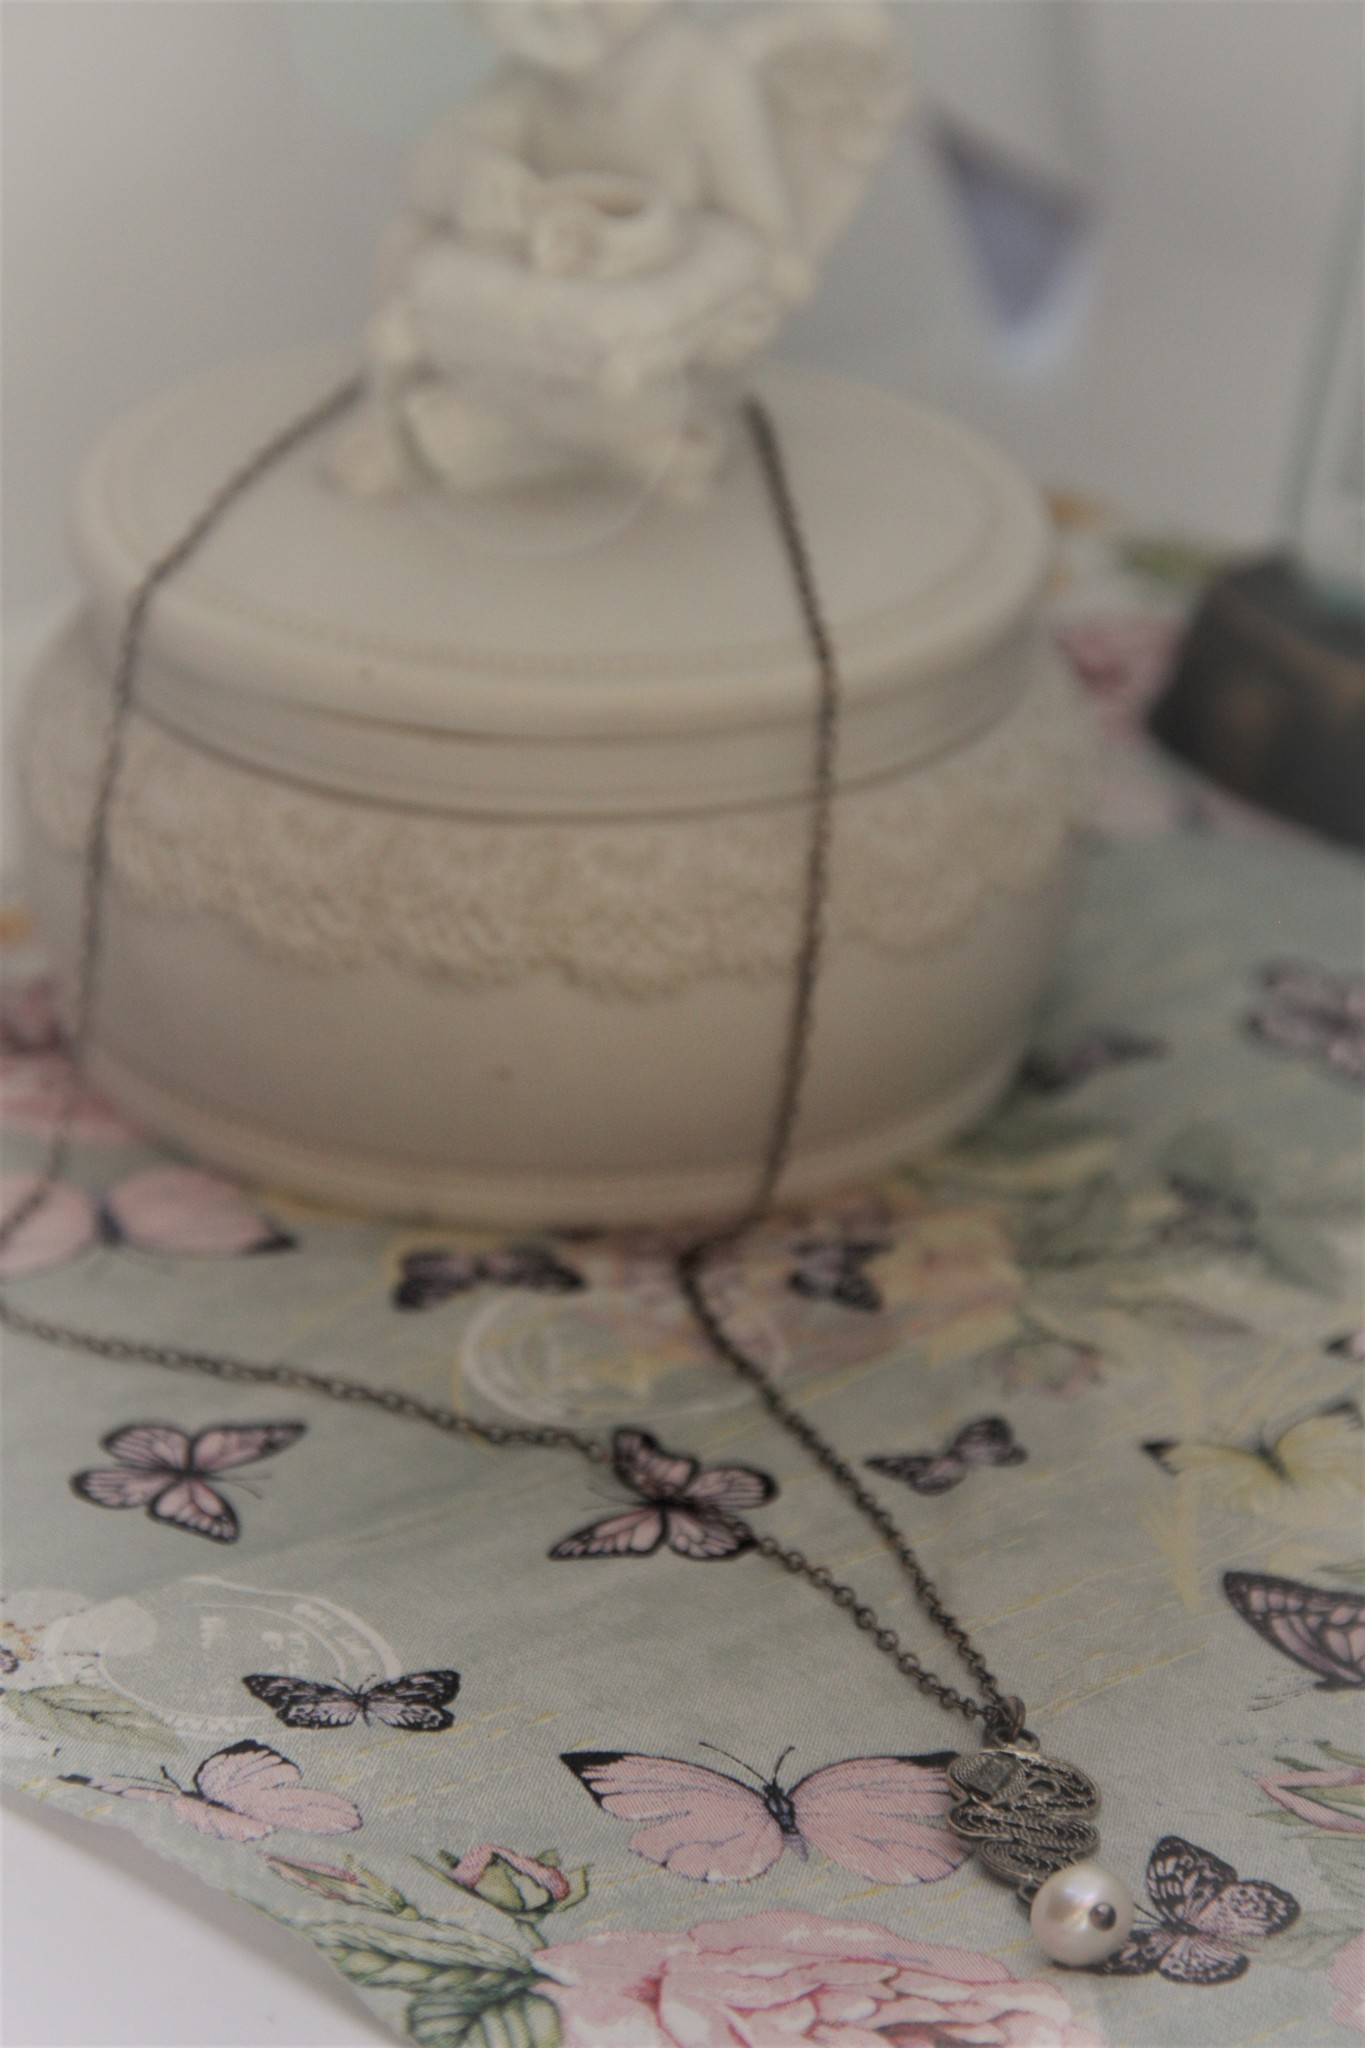 Yvone Christa Fijne ketting van Yvone Christa met hanger witte parel